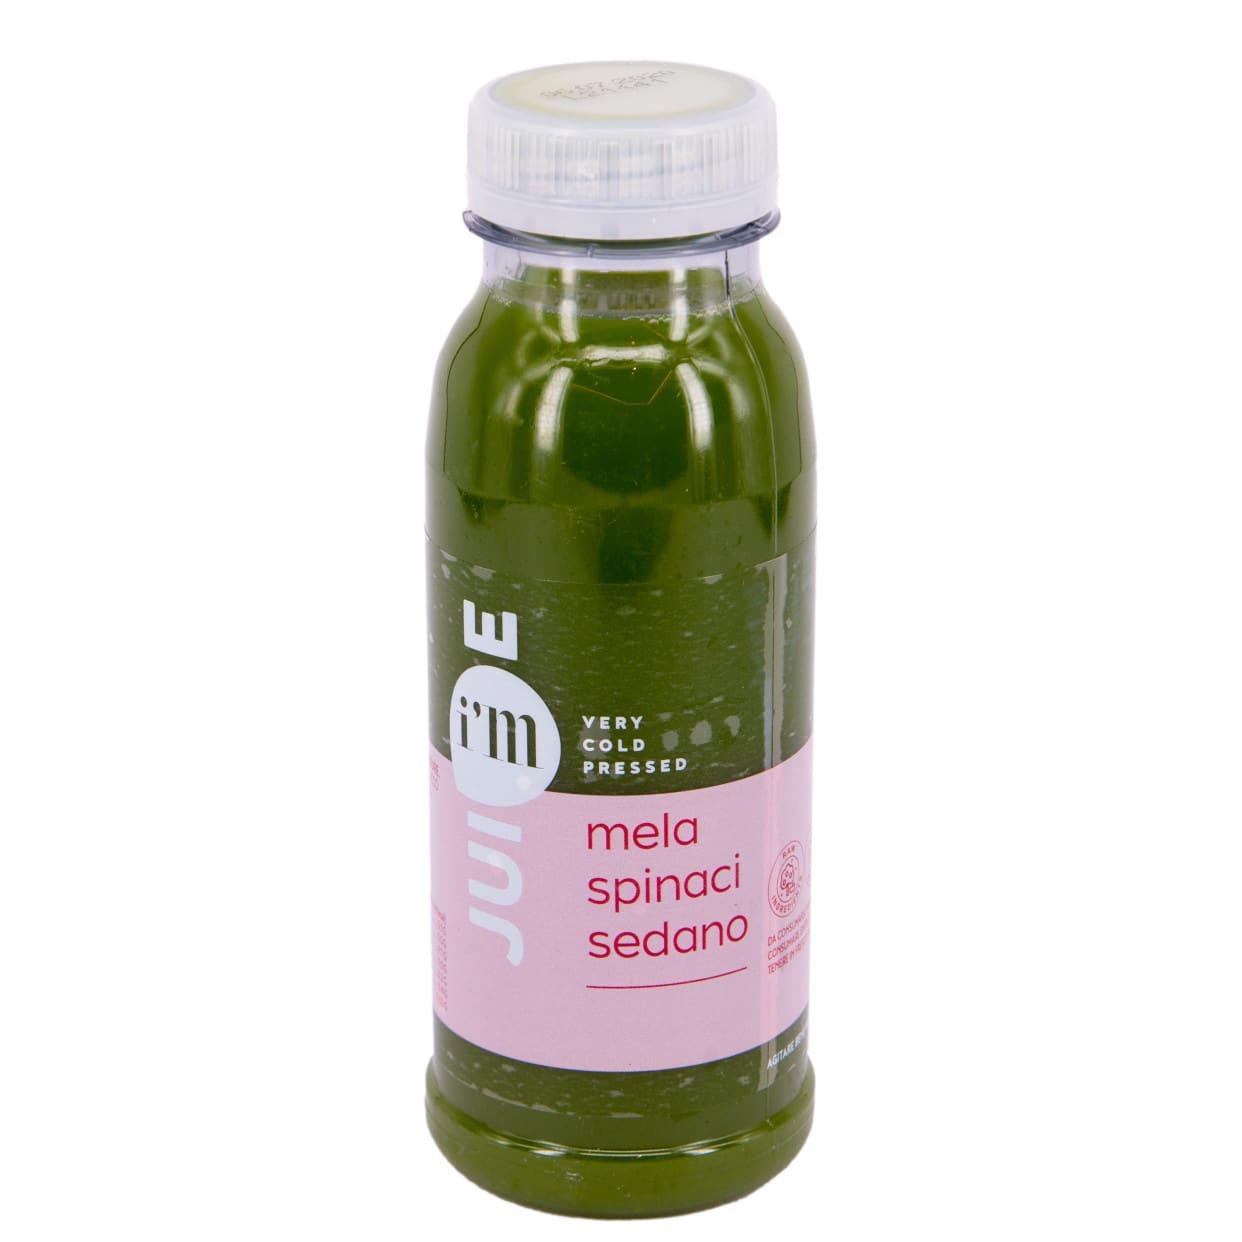 Succo spinaci/mela verde/sedano 25 cl